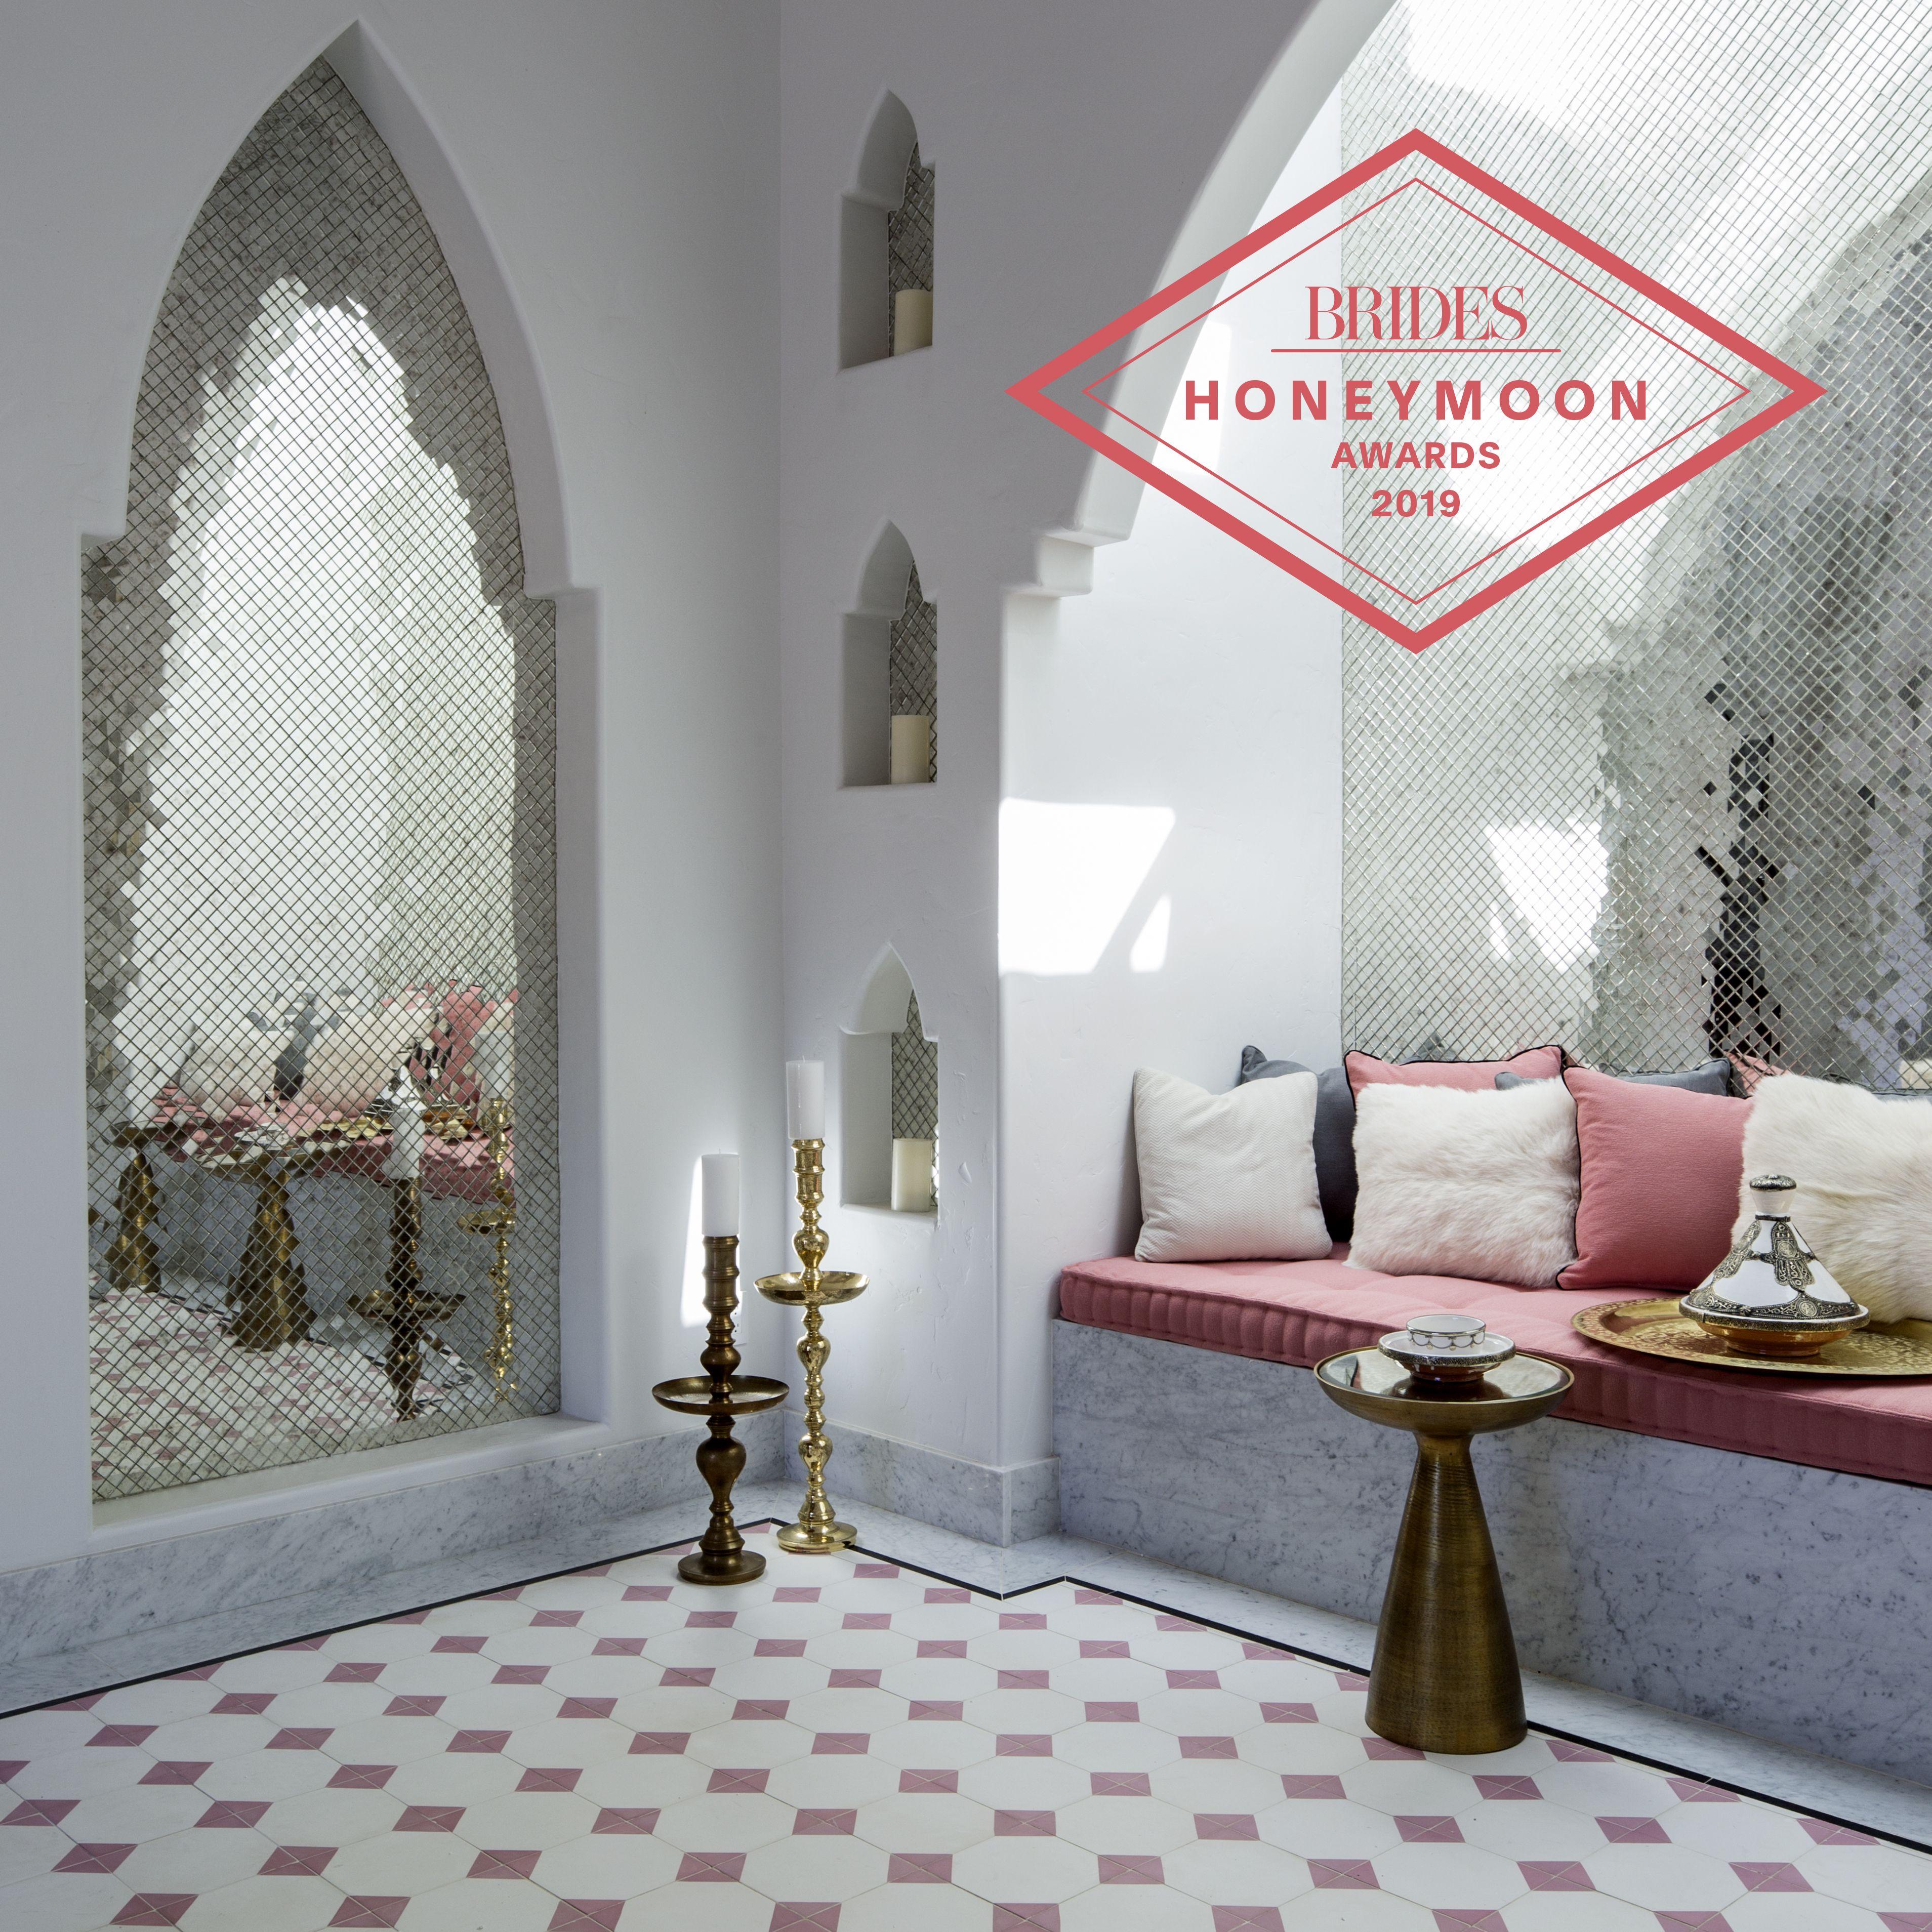 Romantic Awards 2019The Spots To Most Travel Honeymoon Brides 4A5L3jR